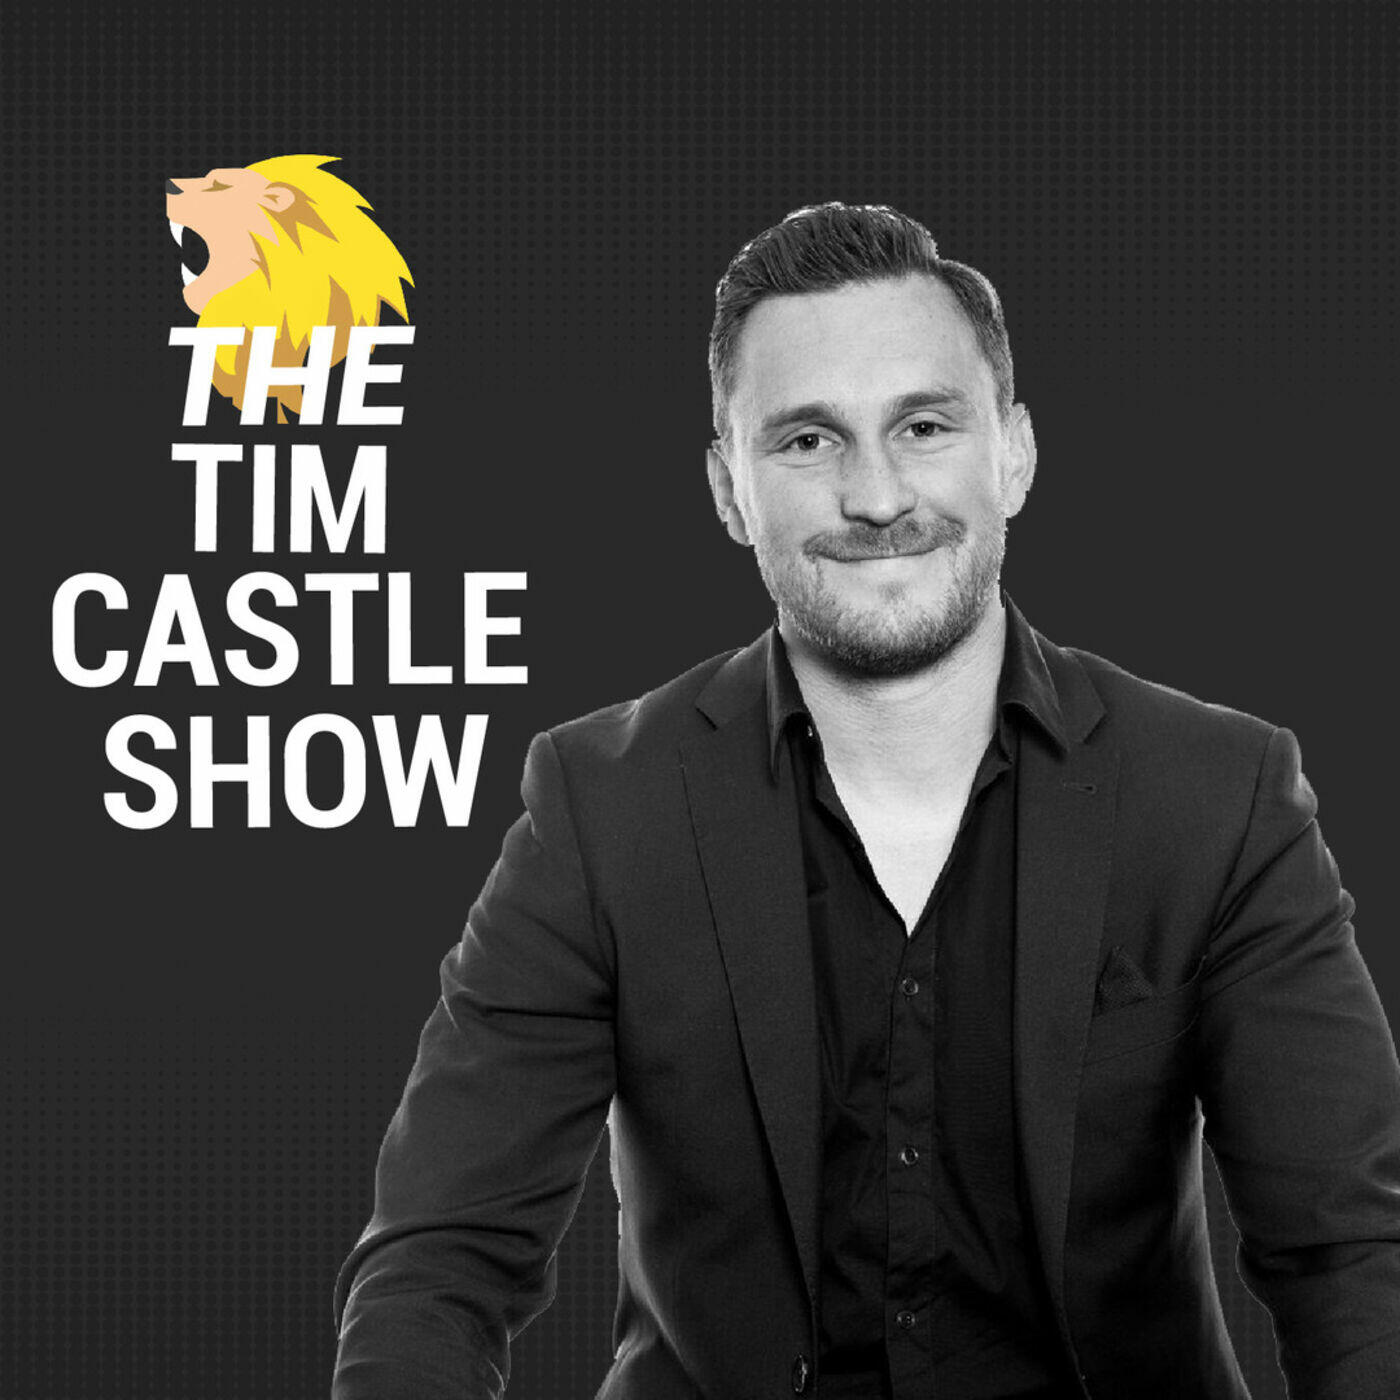 The Tim Castle Show